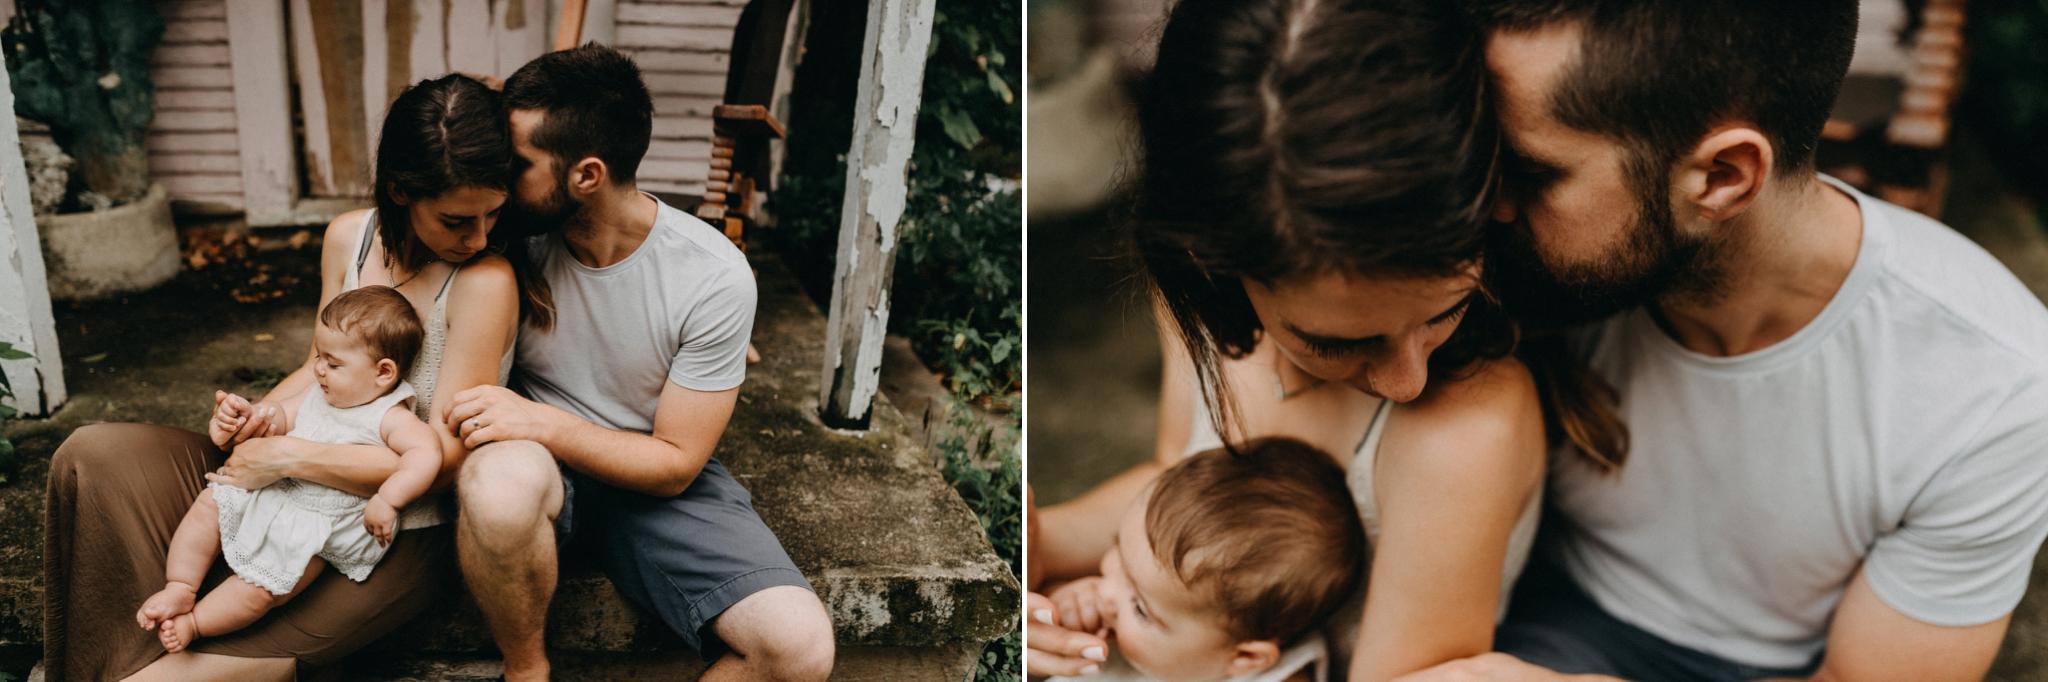 Sekrit-Theater-Greenhouse-Family-Session-Greenery-Vines-Flowers-Kerlyn-Van-Gelder-Photography-Austin-Photographer